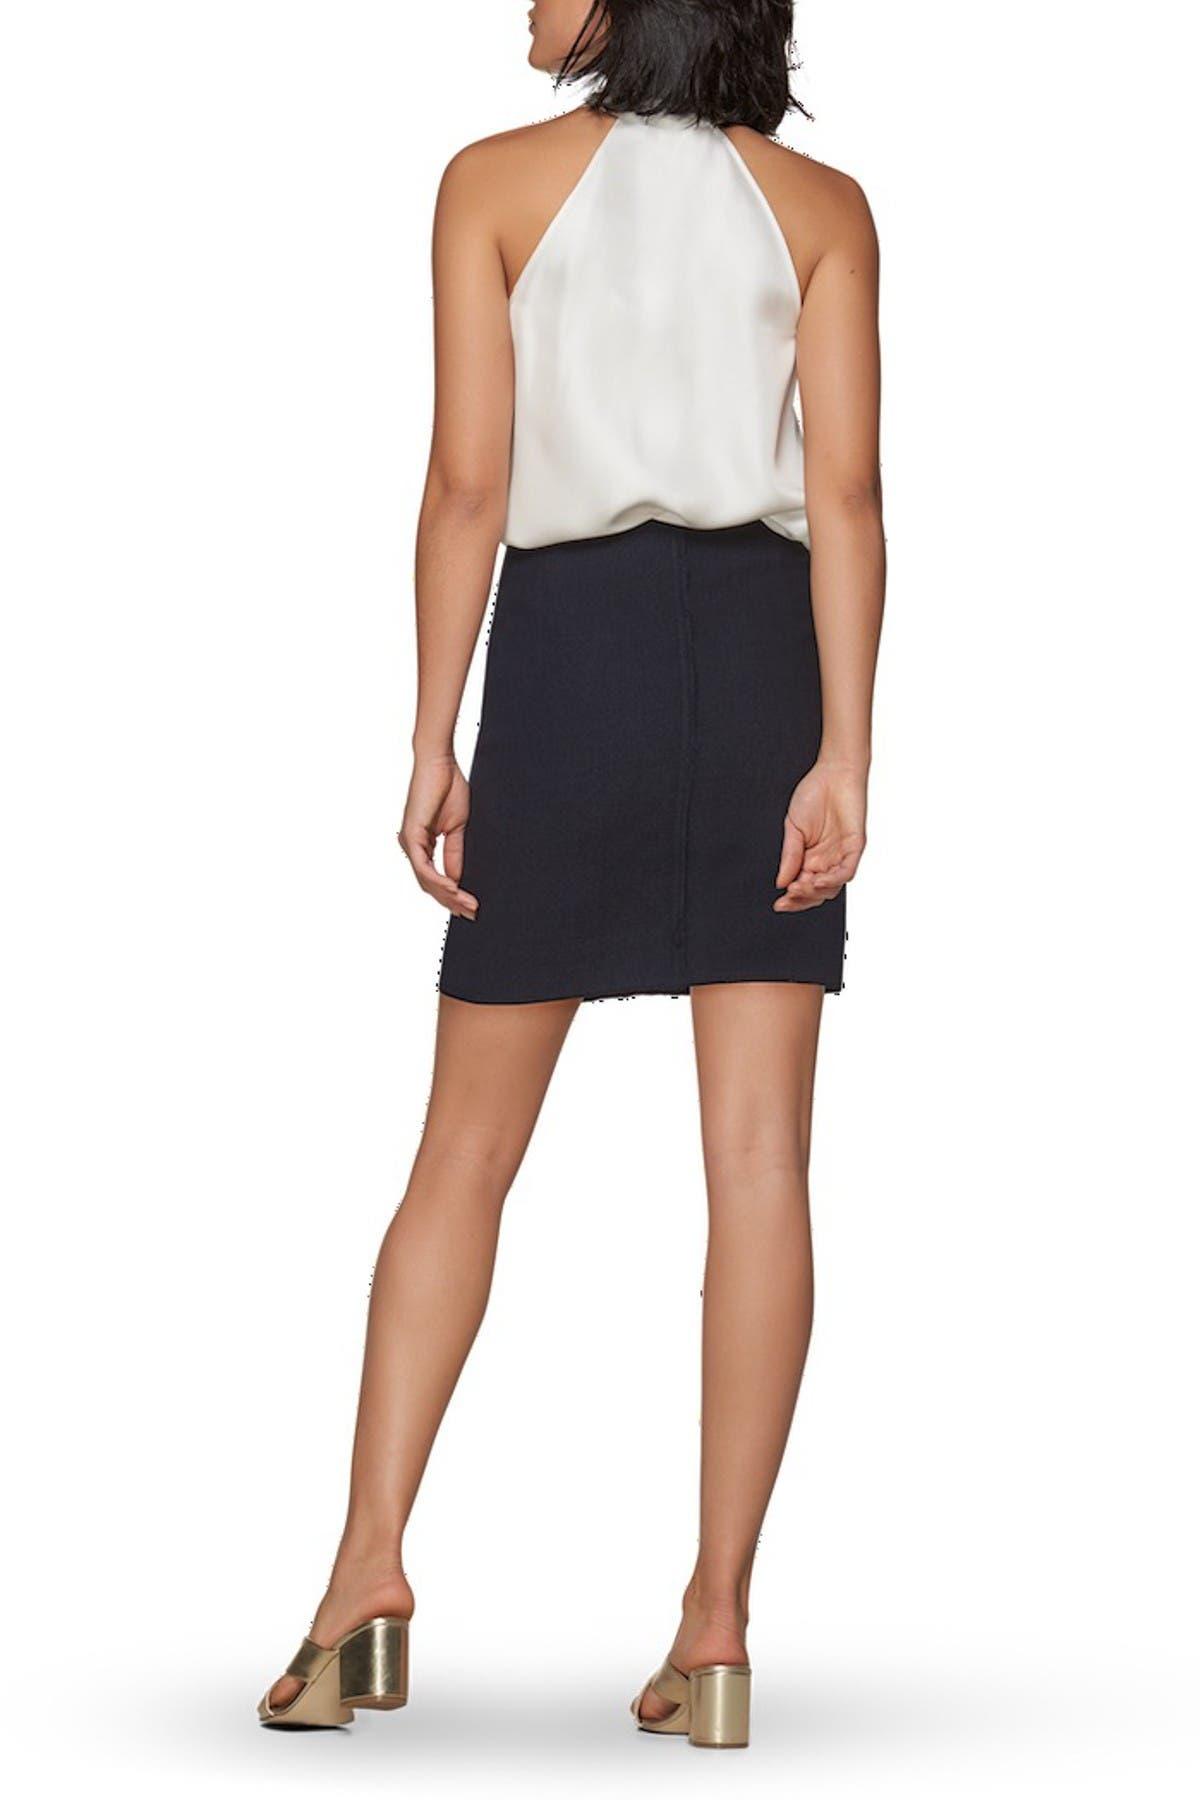 Image of SUISTUDIO Nash Mini Skirt